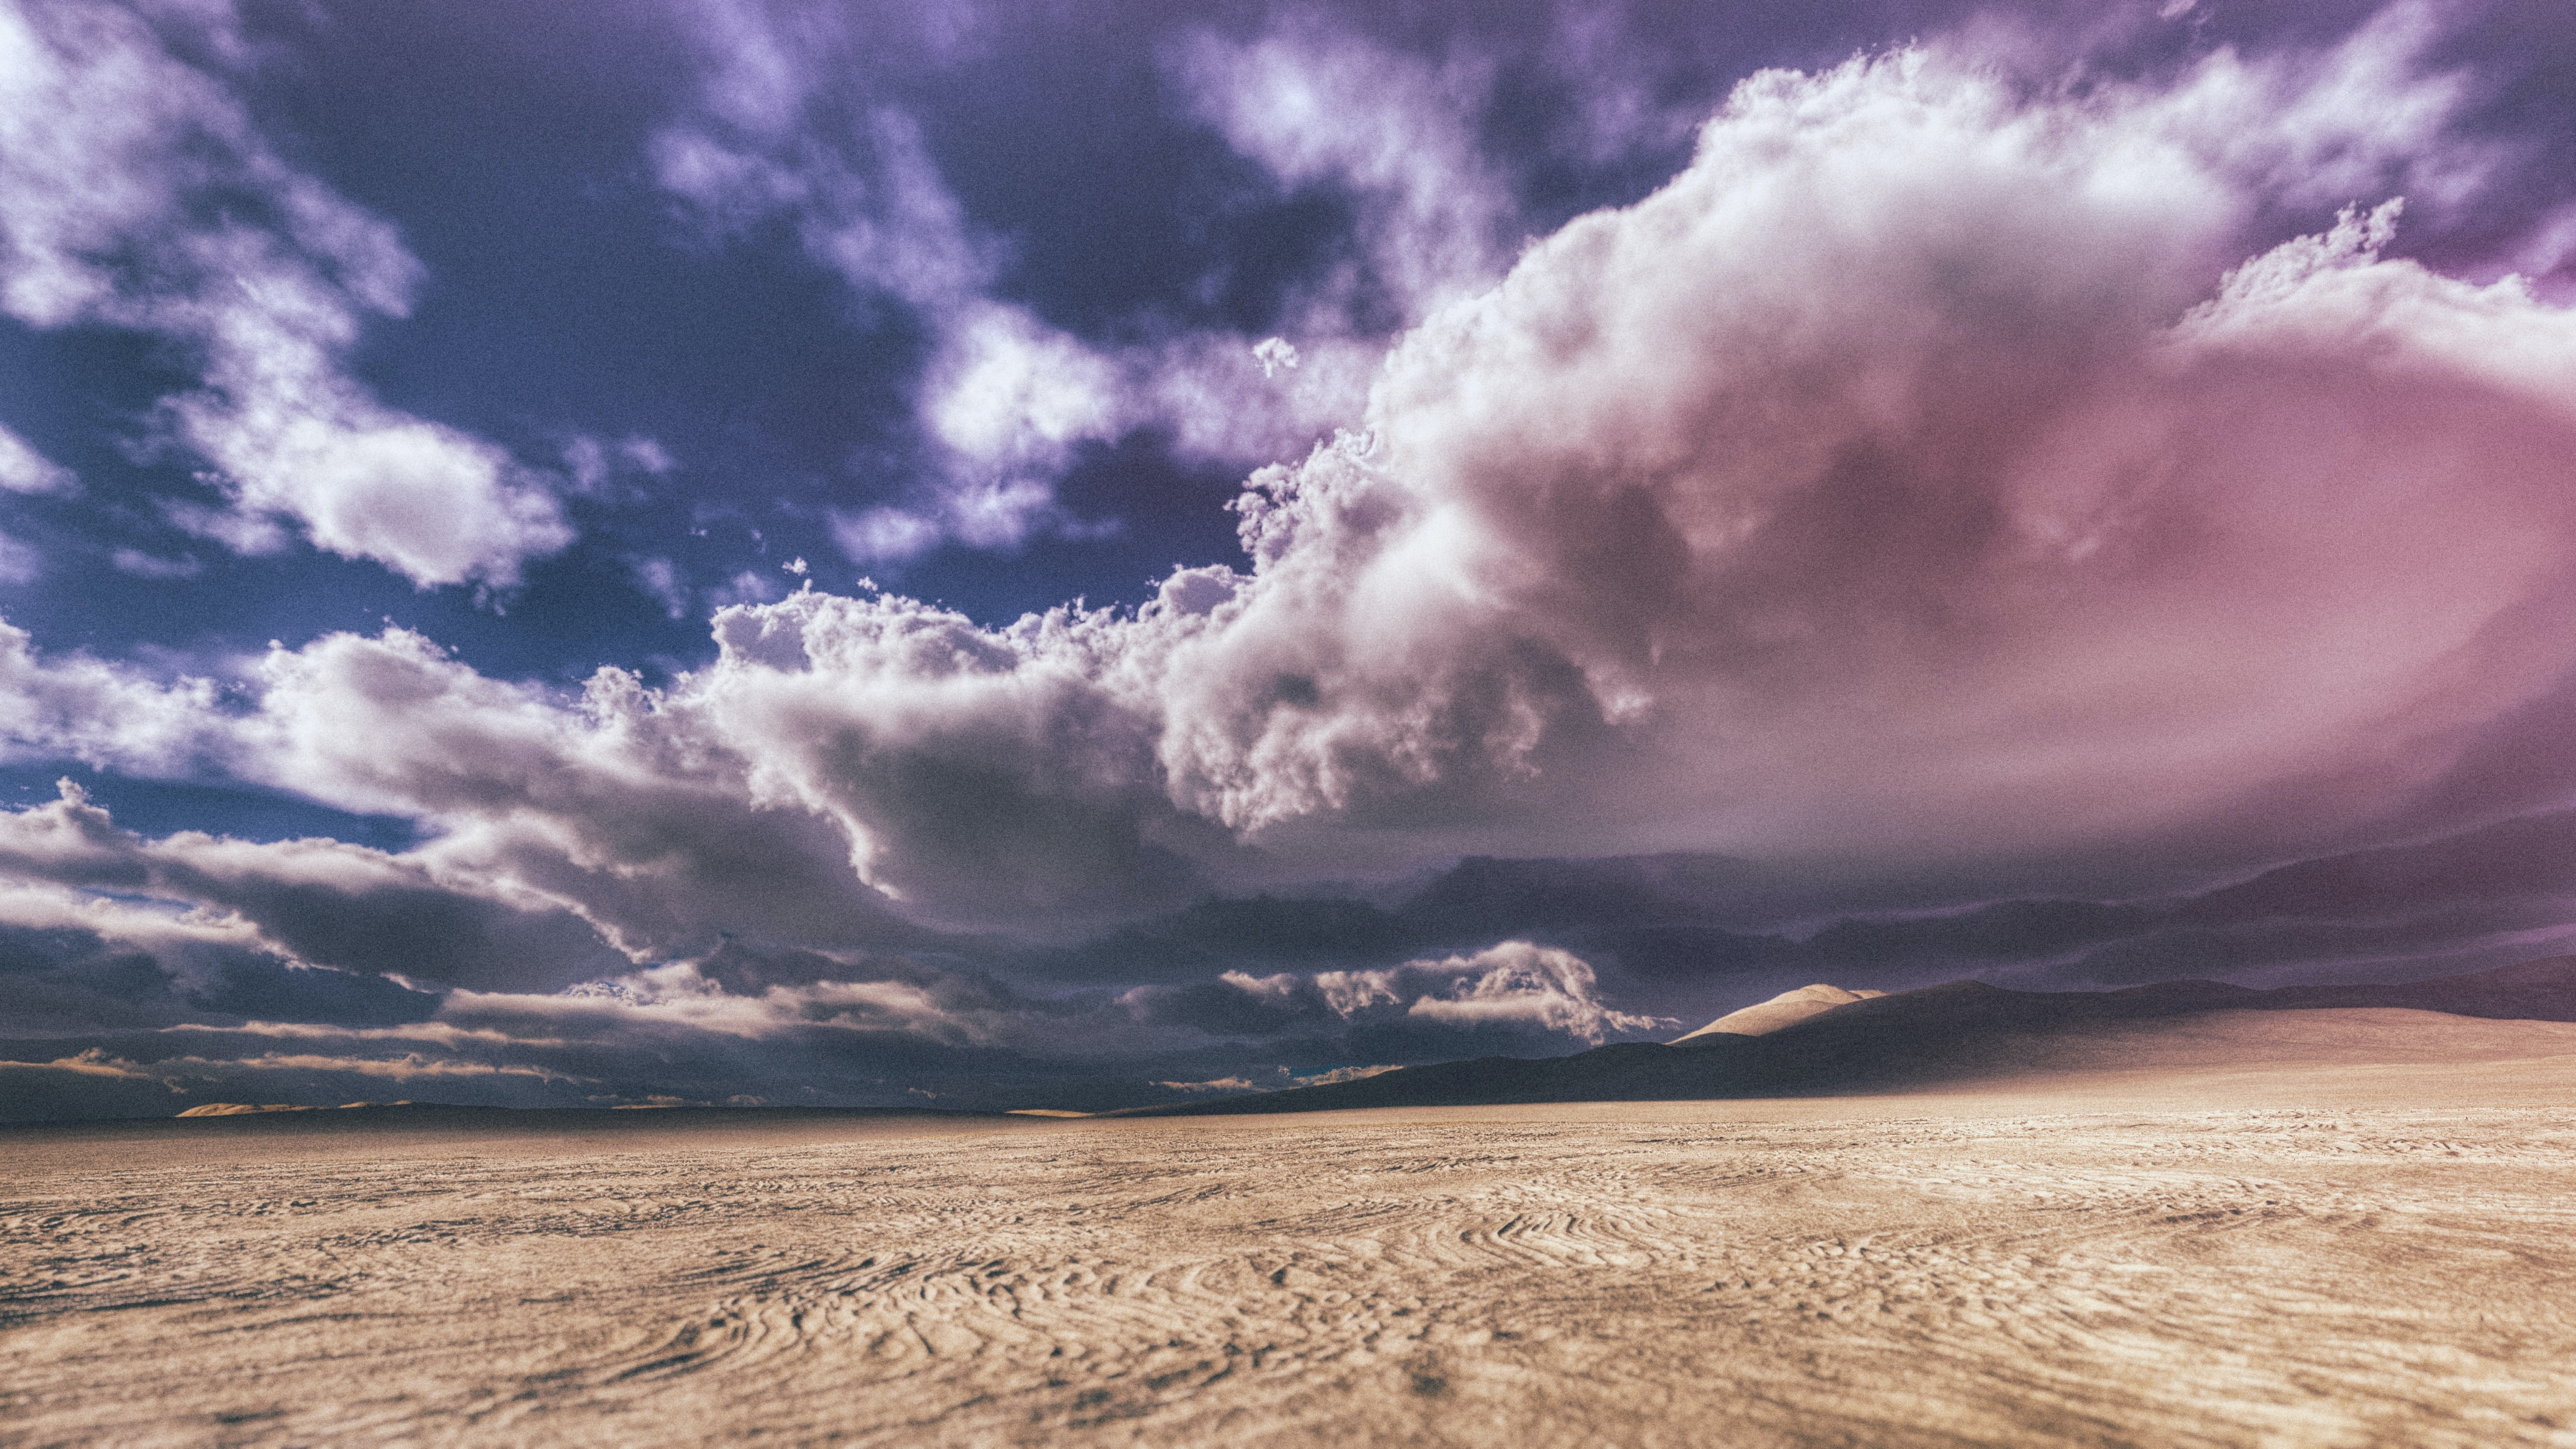 empty desert under gray couldy sky